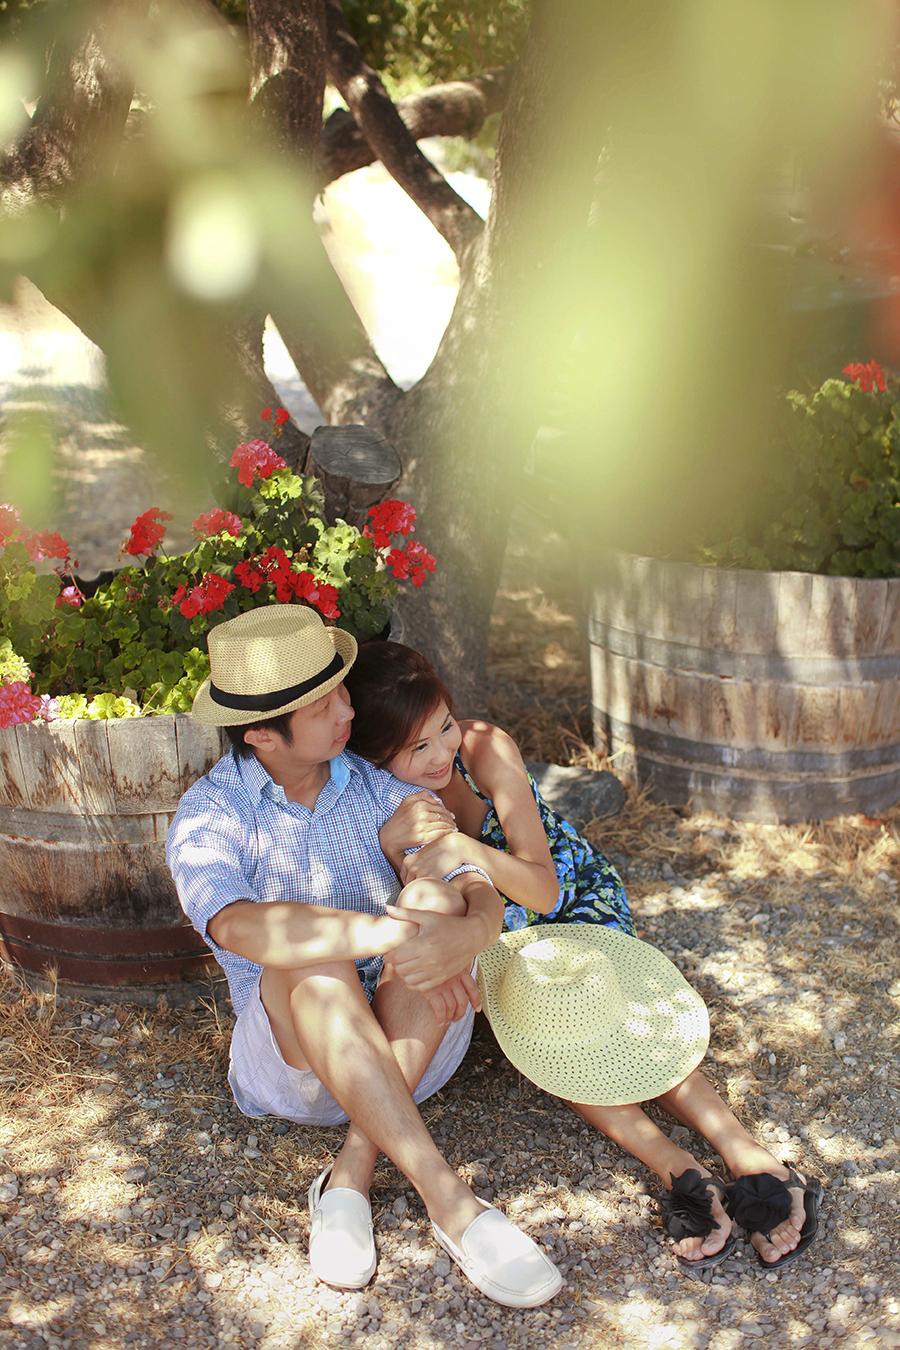 santorini greece . wedding photography by kurt ahs . 3101.jpg